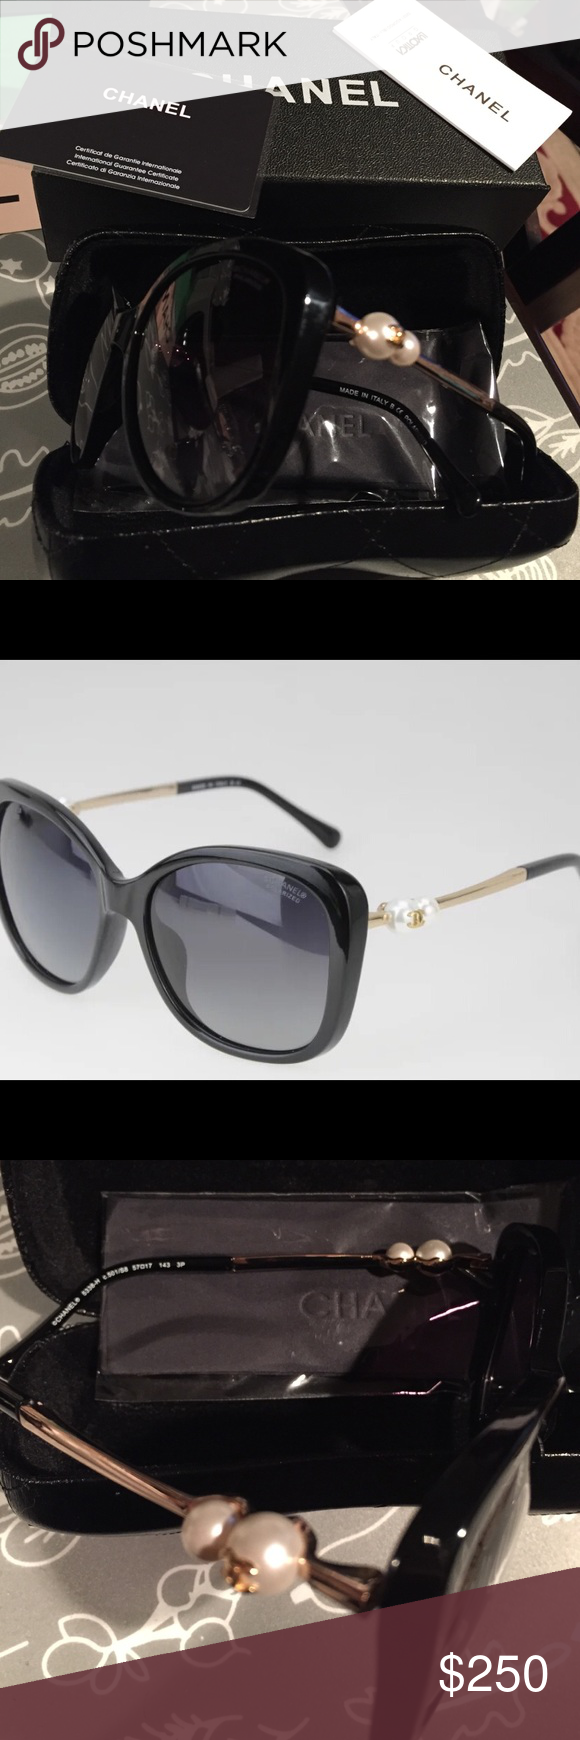 Chanel pearl 5338-H sunglasses in case and box Gorgeous brand new sunglasses CHANEL Accessories Sunglasses